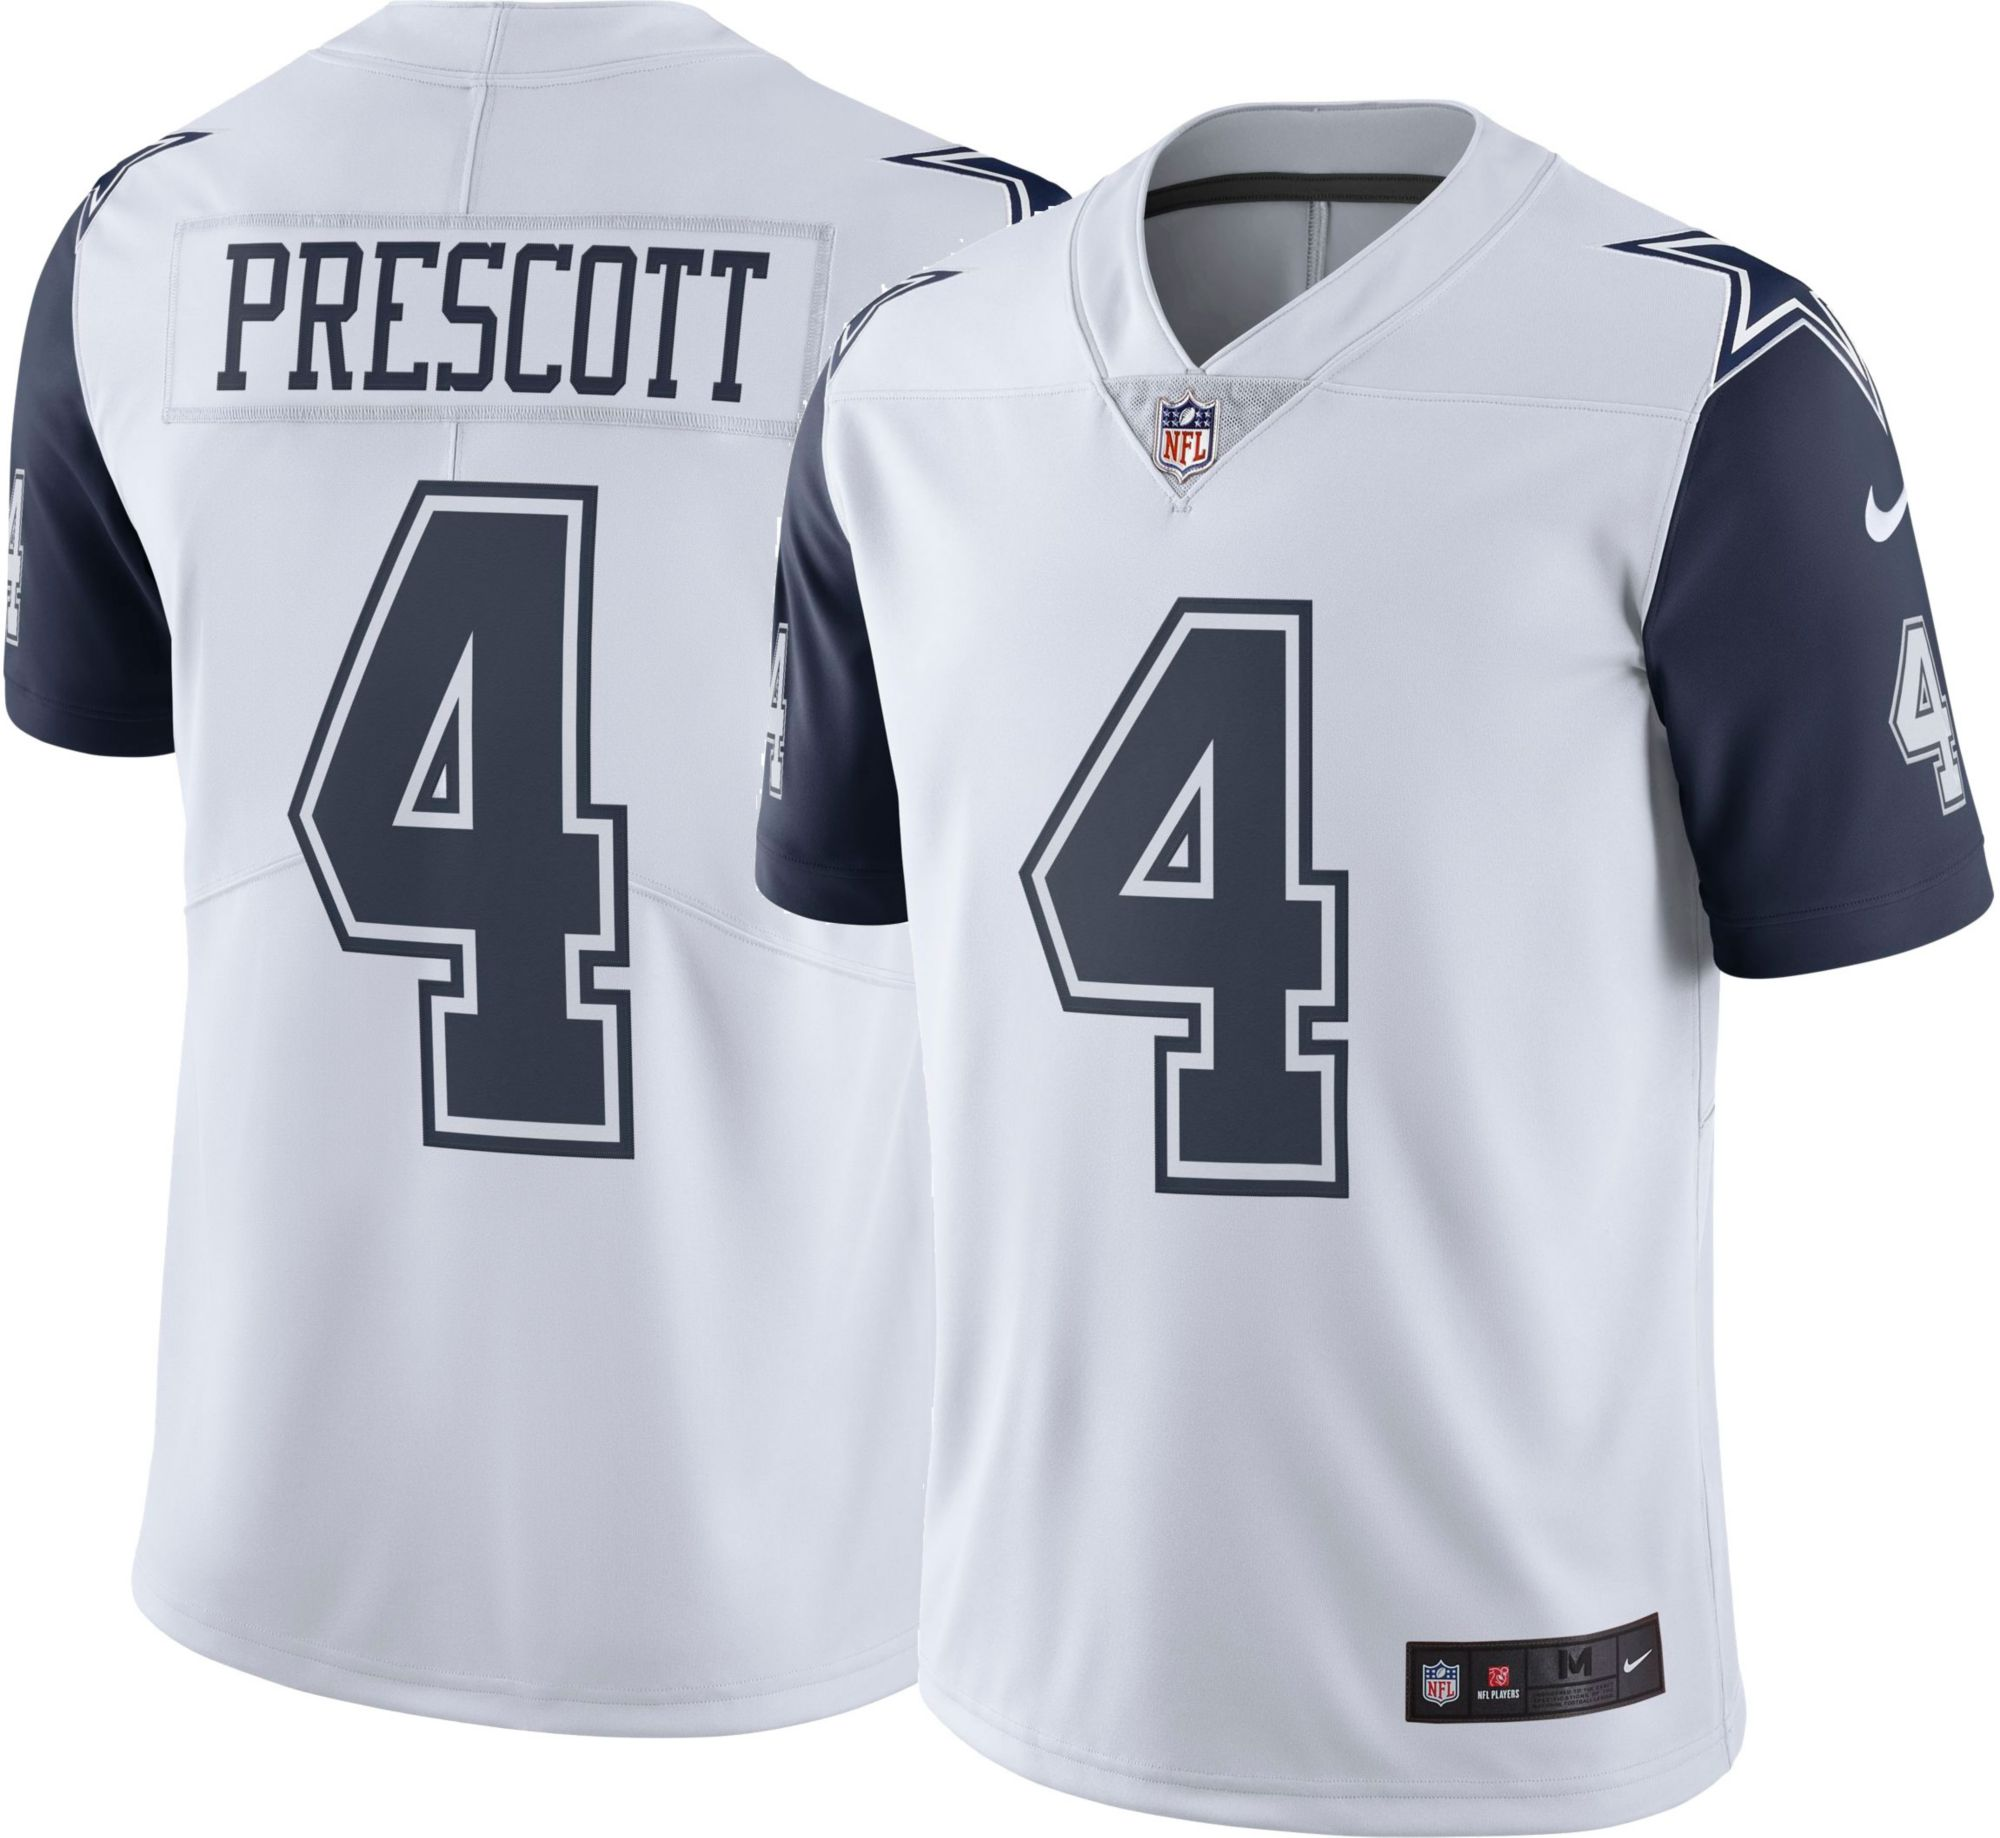 ladies dallas cowboys jersey jersey on sale